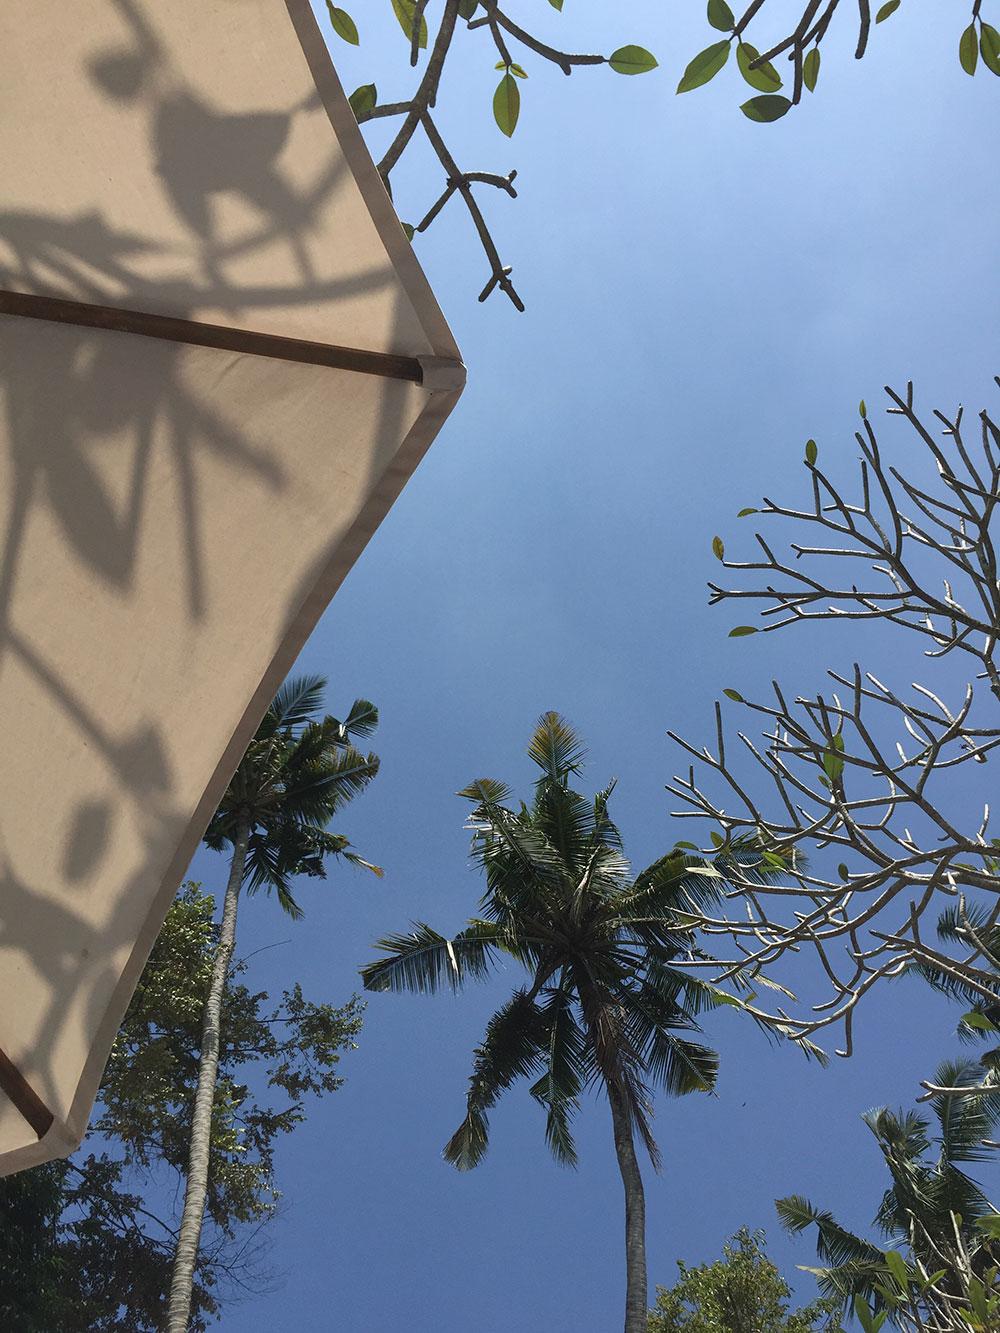 RosyCheeks-Bali-Fivelements-sky